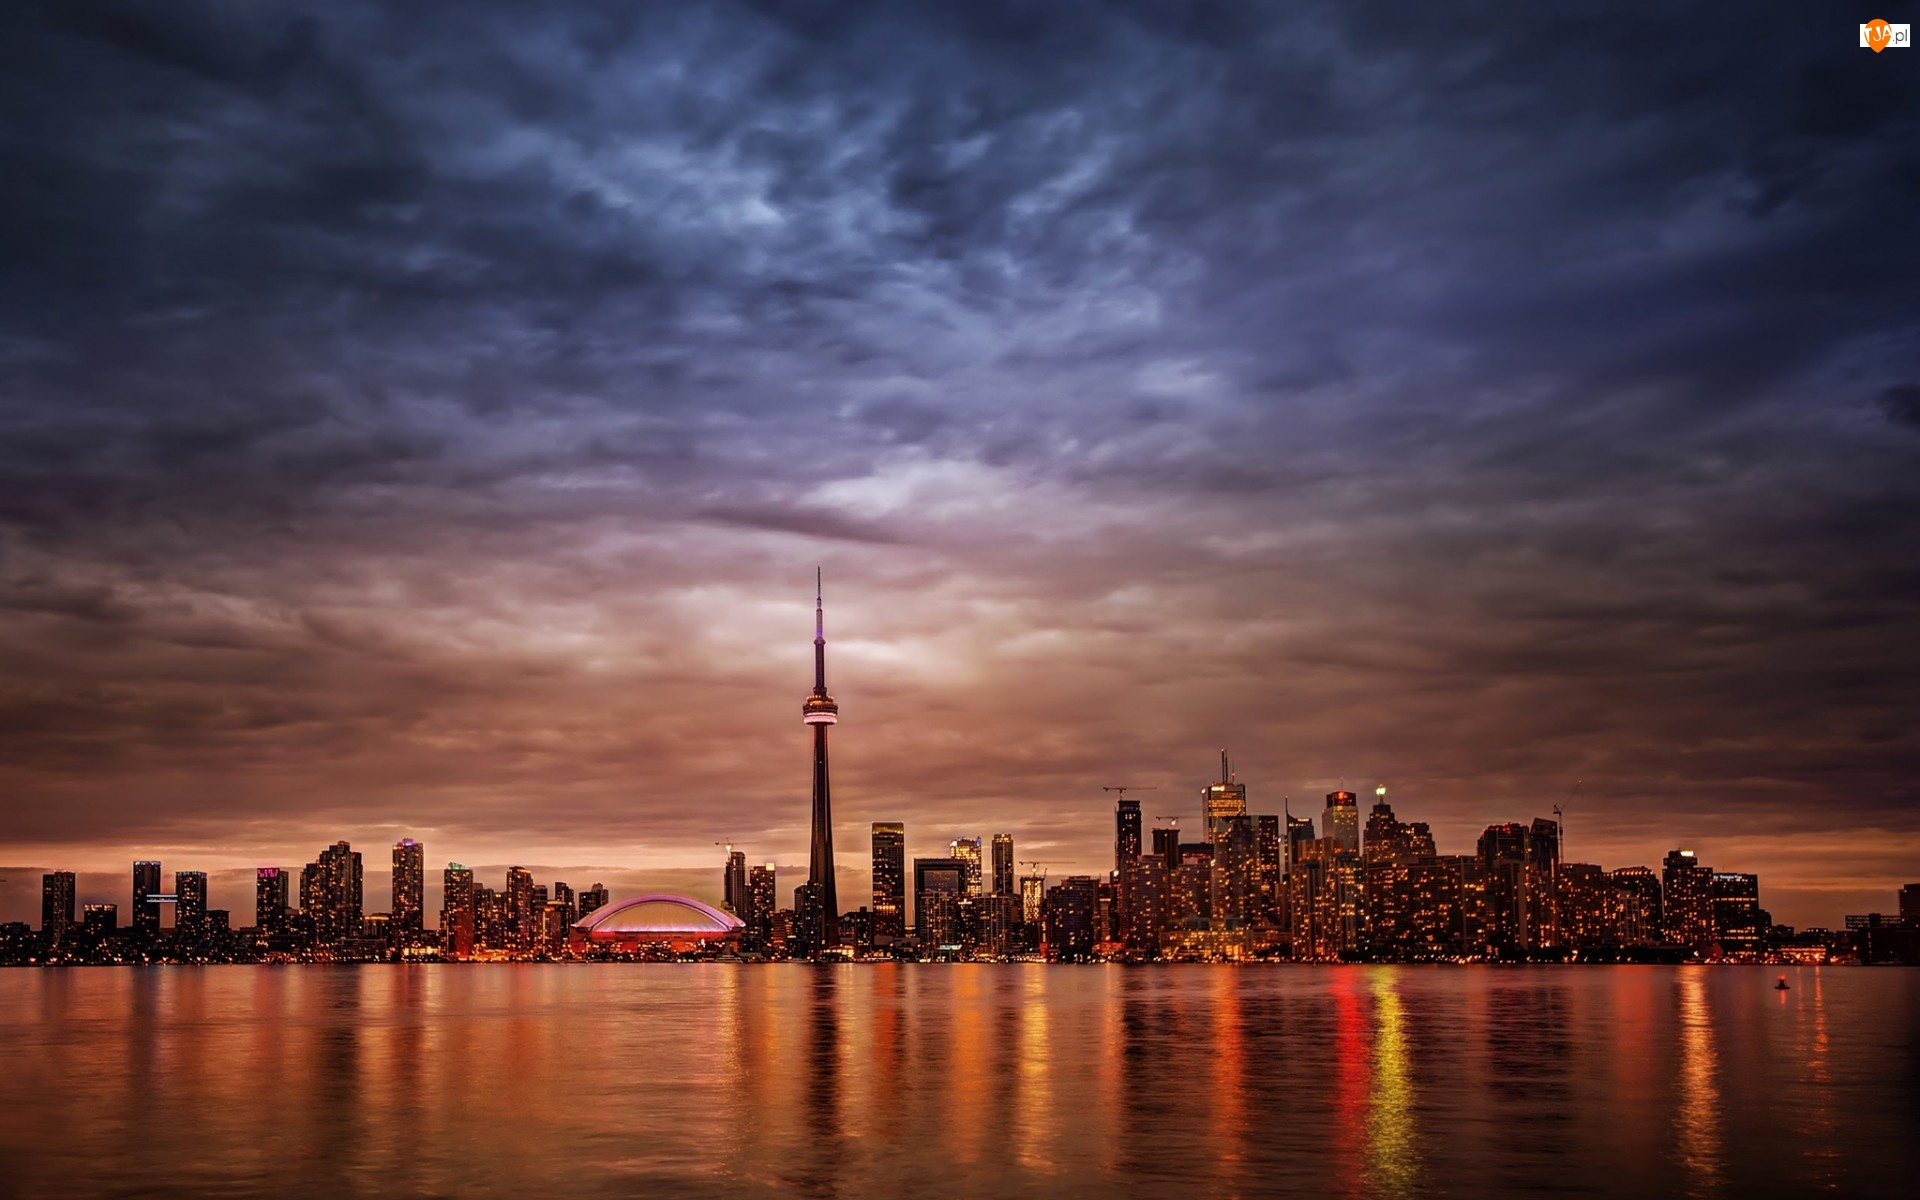 Kanada, Drapacze, Morze, Chmur, Toronto